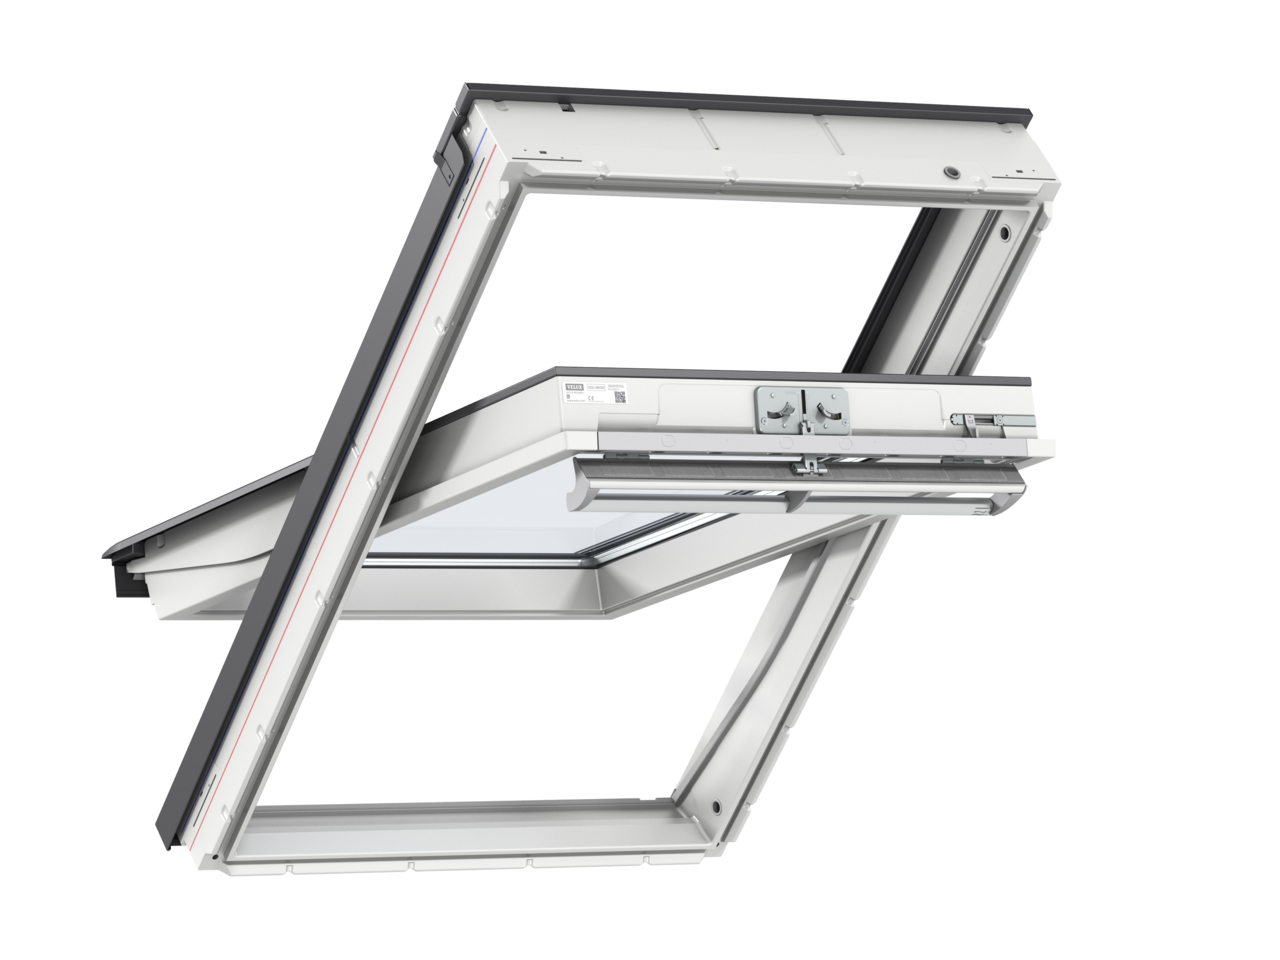 Velux GGU CK06 550 x 1180mm Centre Pivot 34Pane Roof Window - White Polyurethane